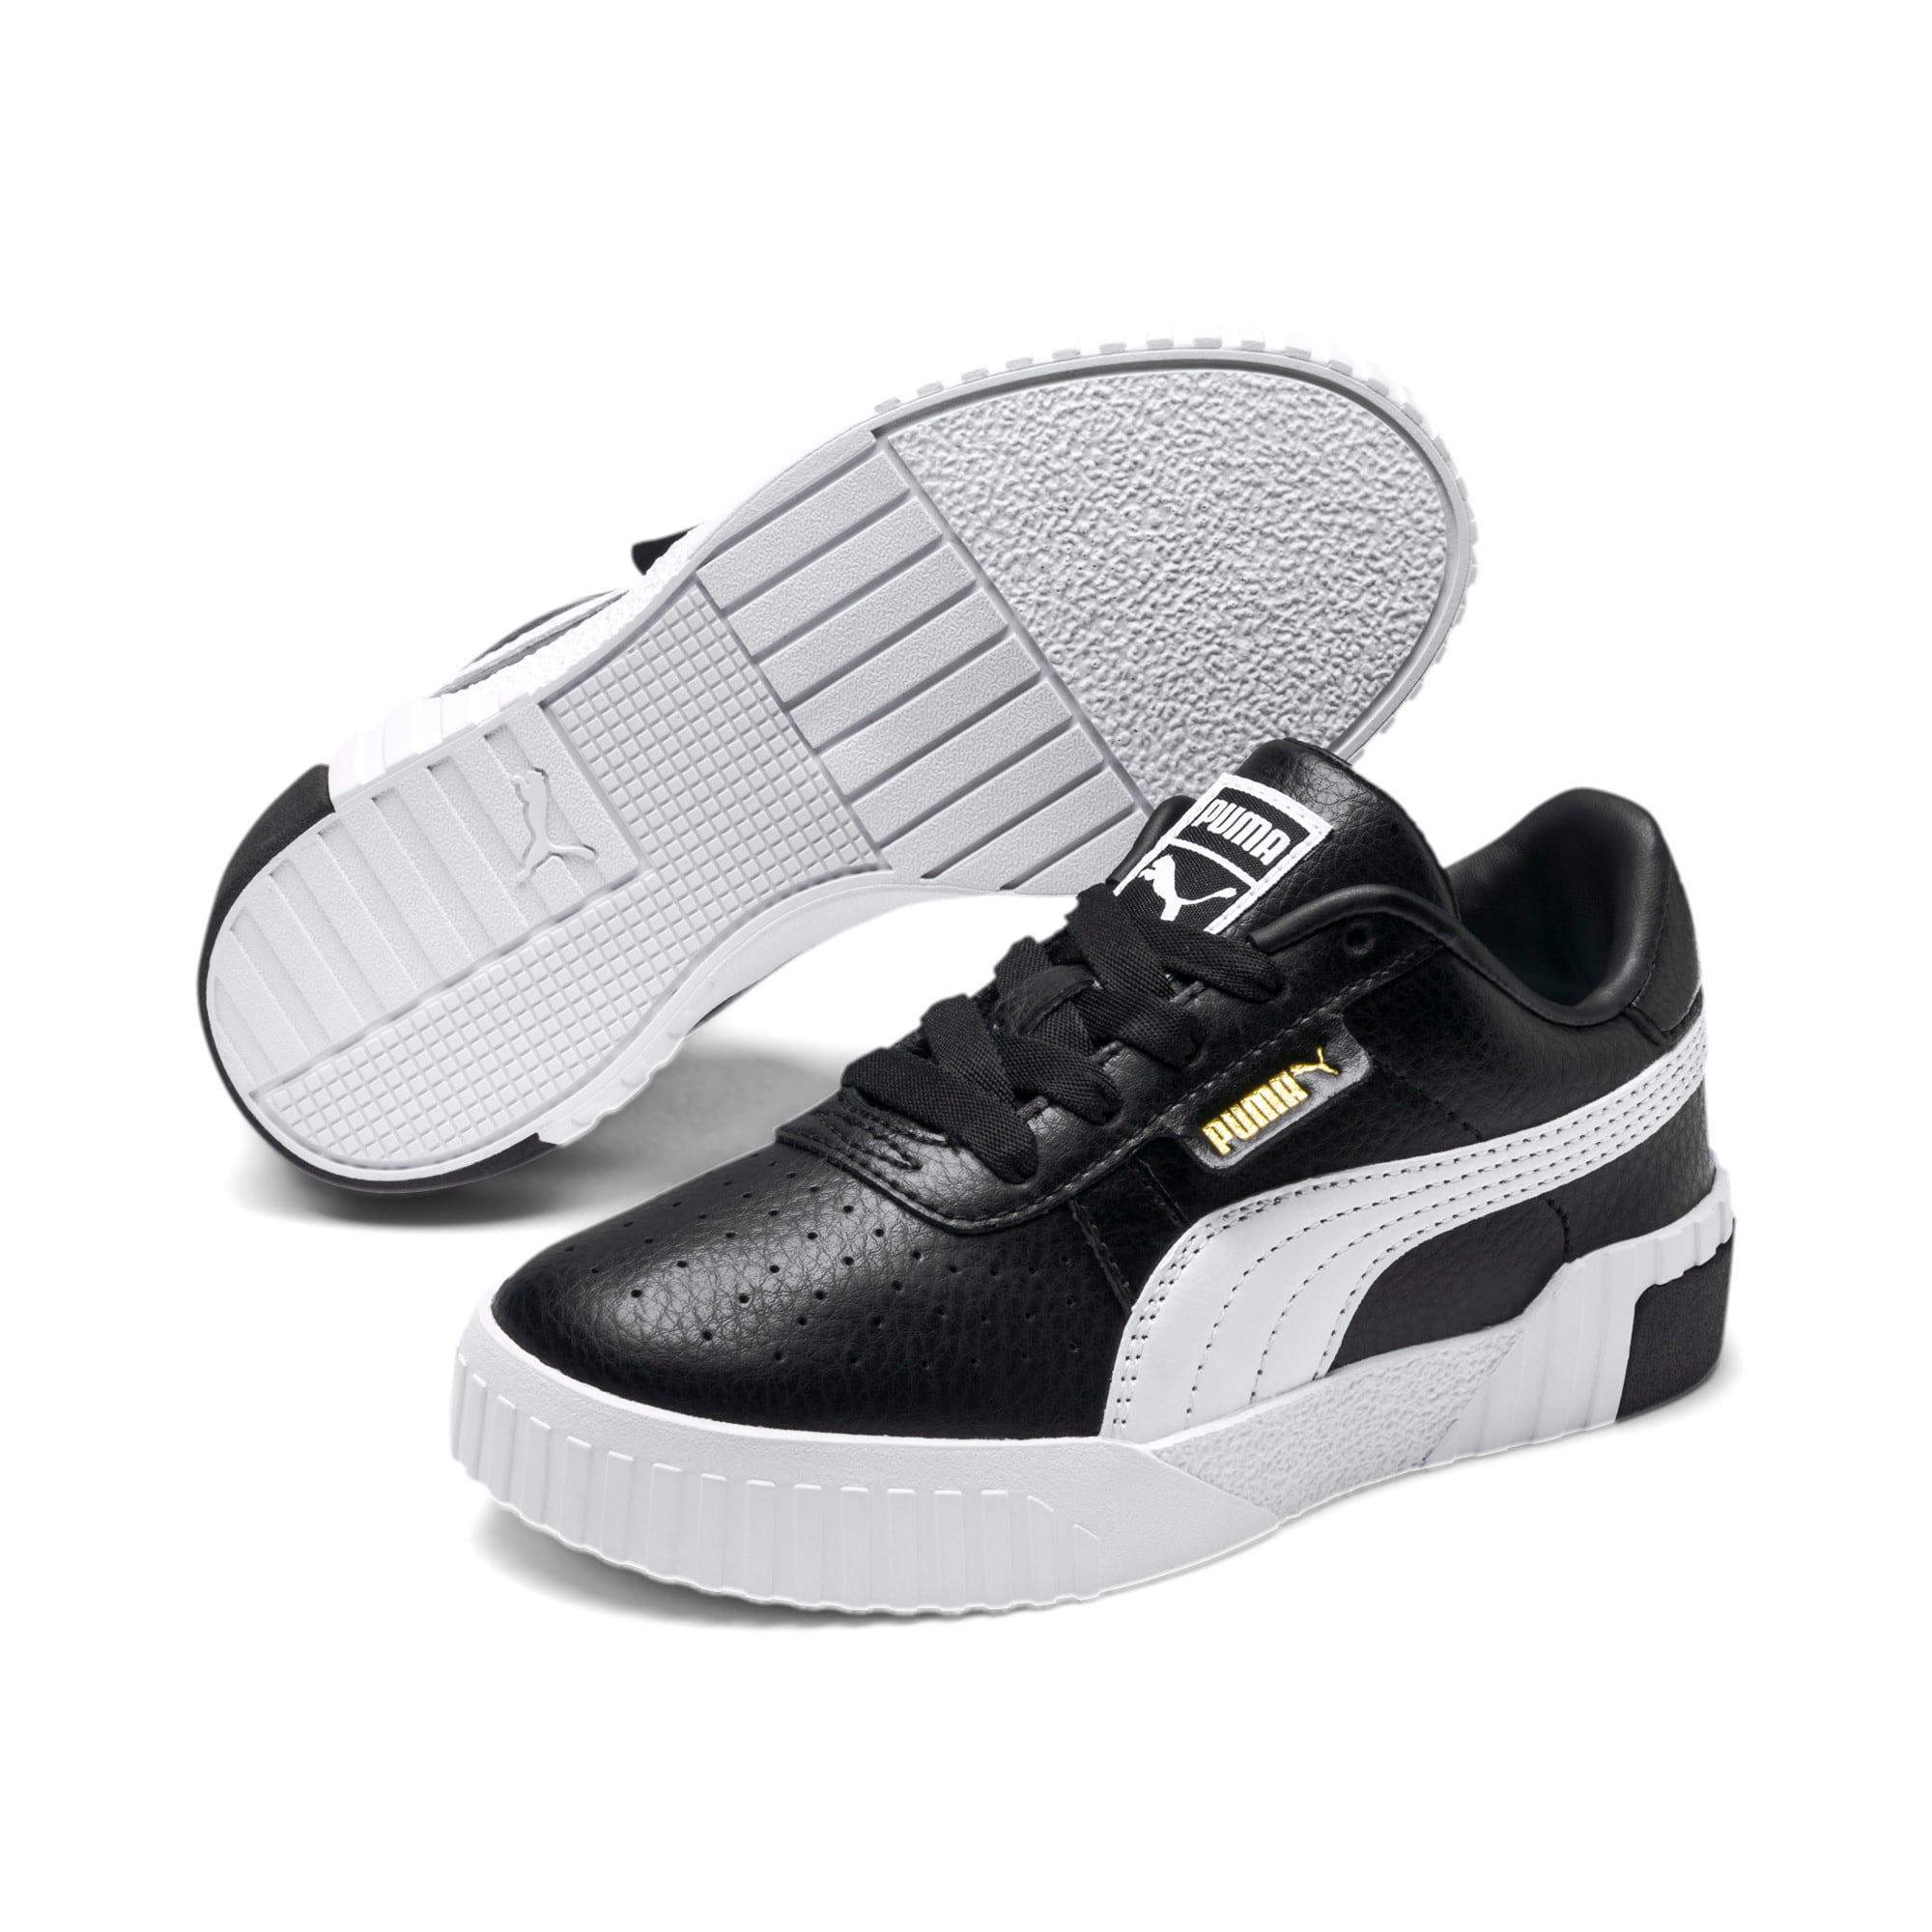 Thumbnail 2 of Cali Kids' Mädchen Sneaker, Puma Black-Puma Team Gold, medium